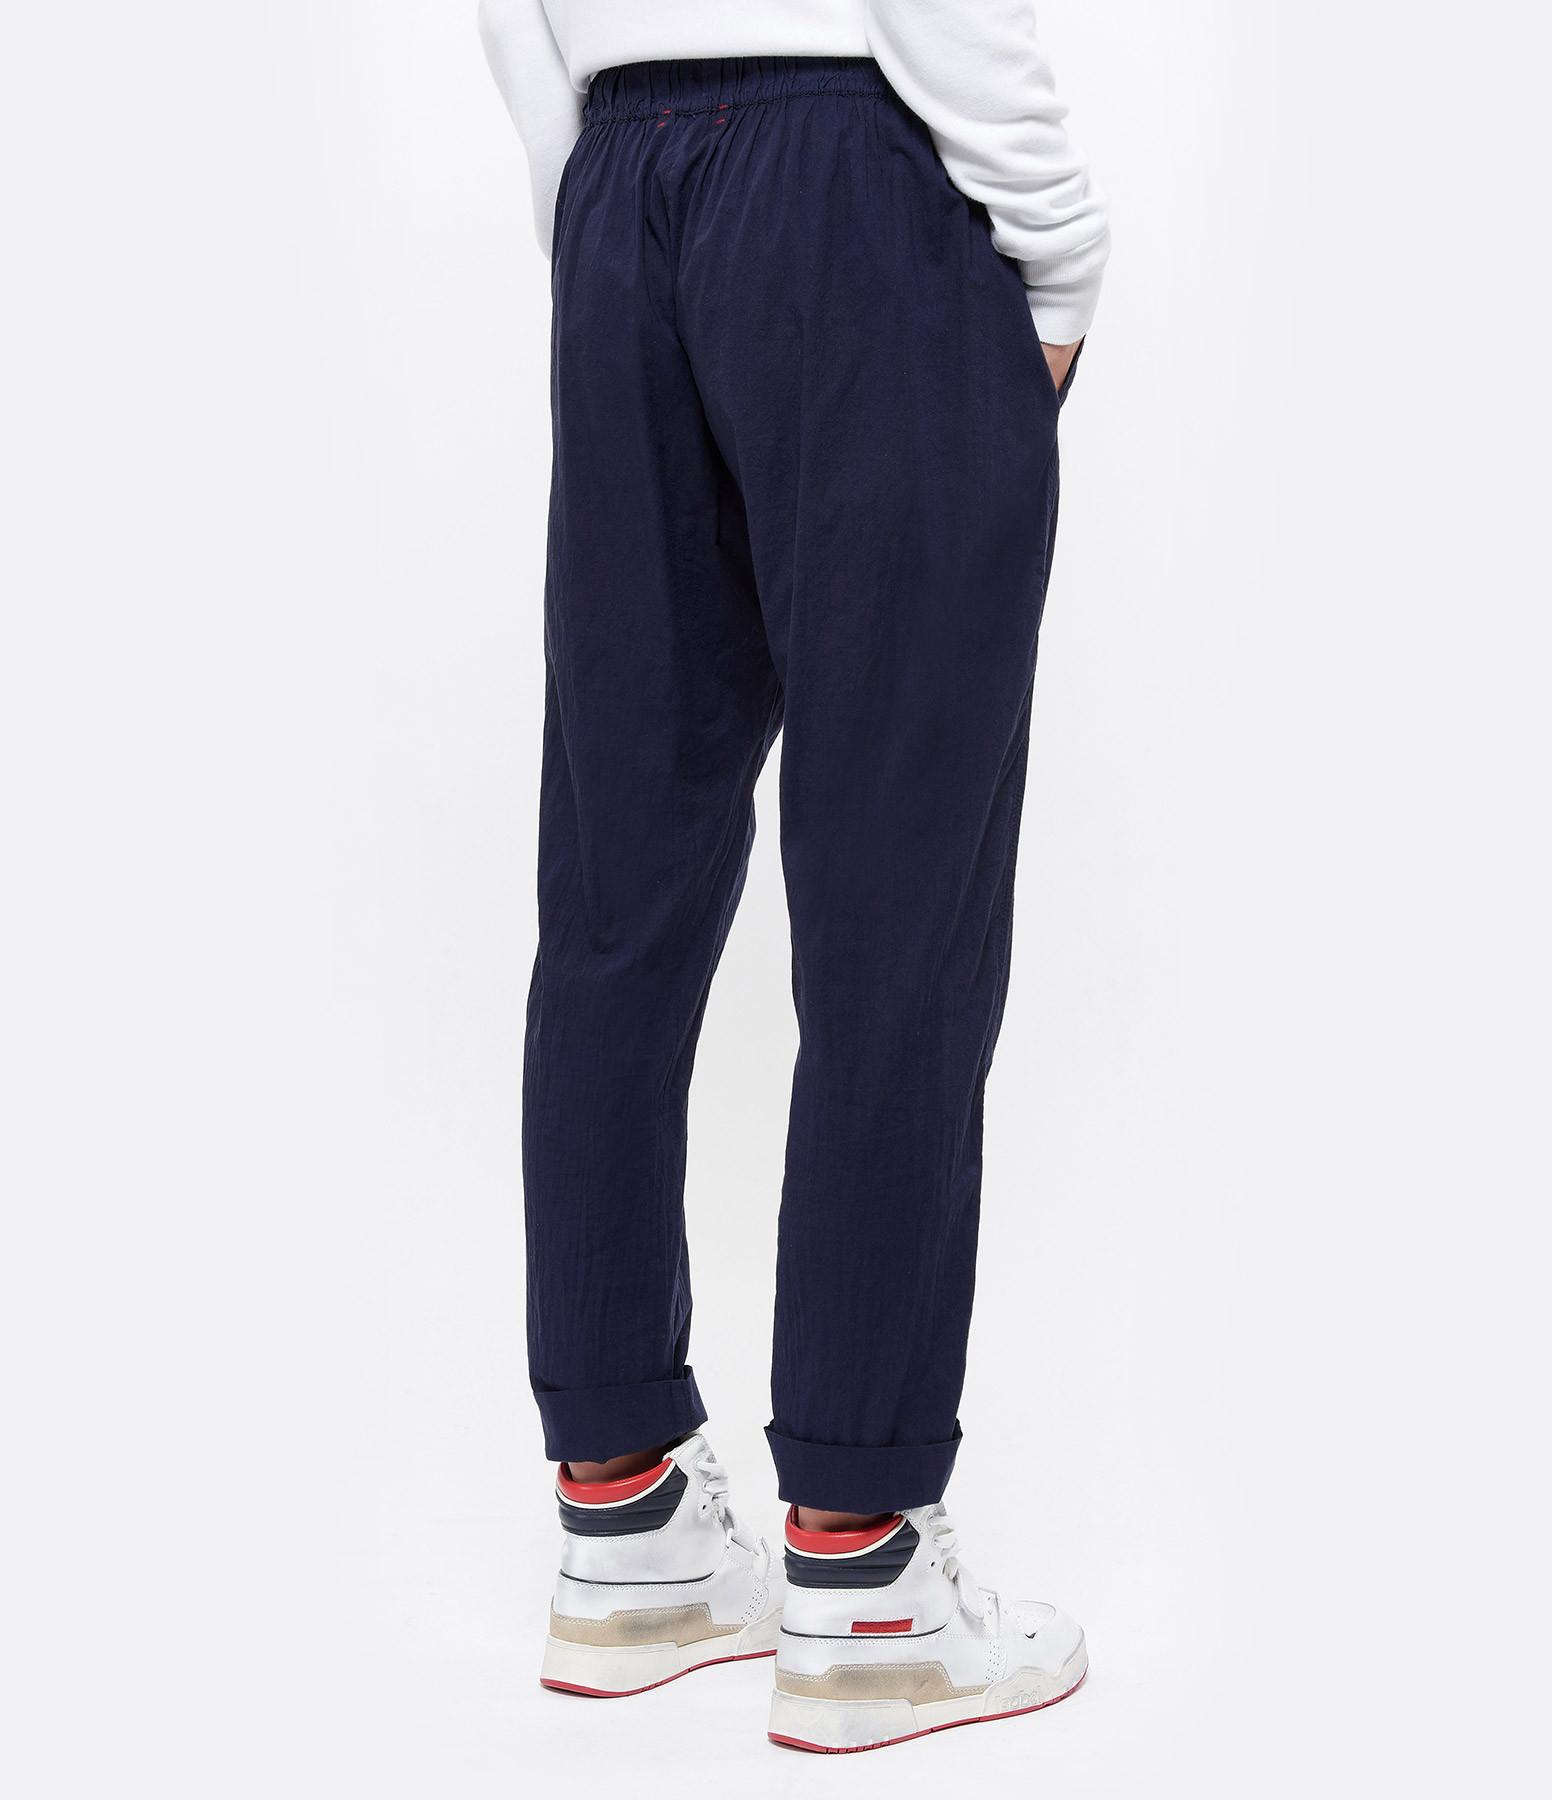 XIRENA - Pantalon Draper Navy